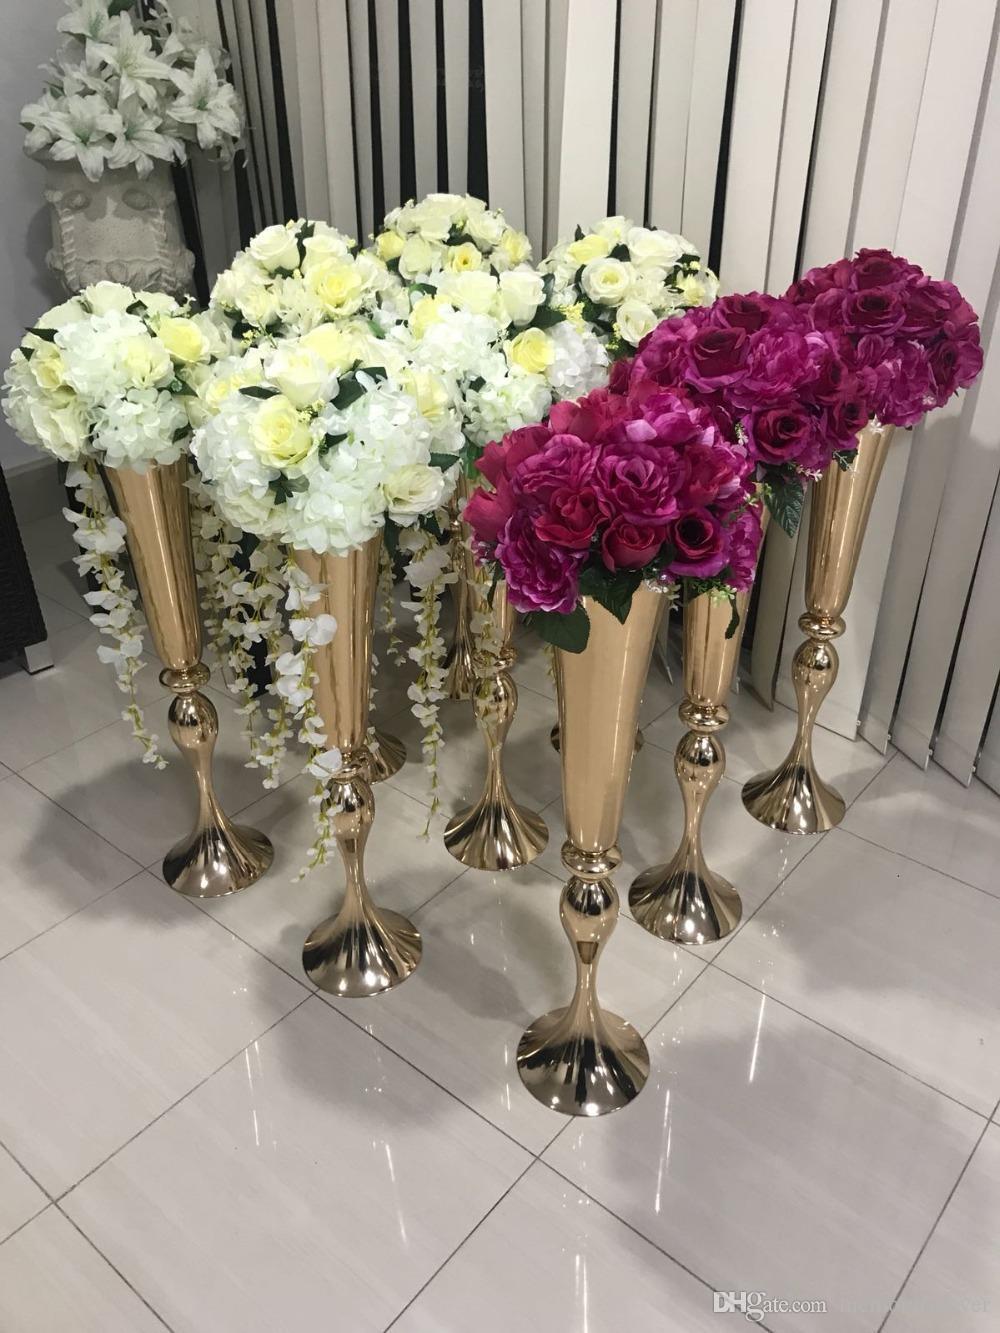 Acheter Vente Chaude Brillant Or Mariage Fleur Vase 75 Cm